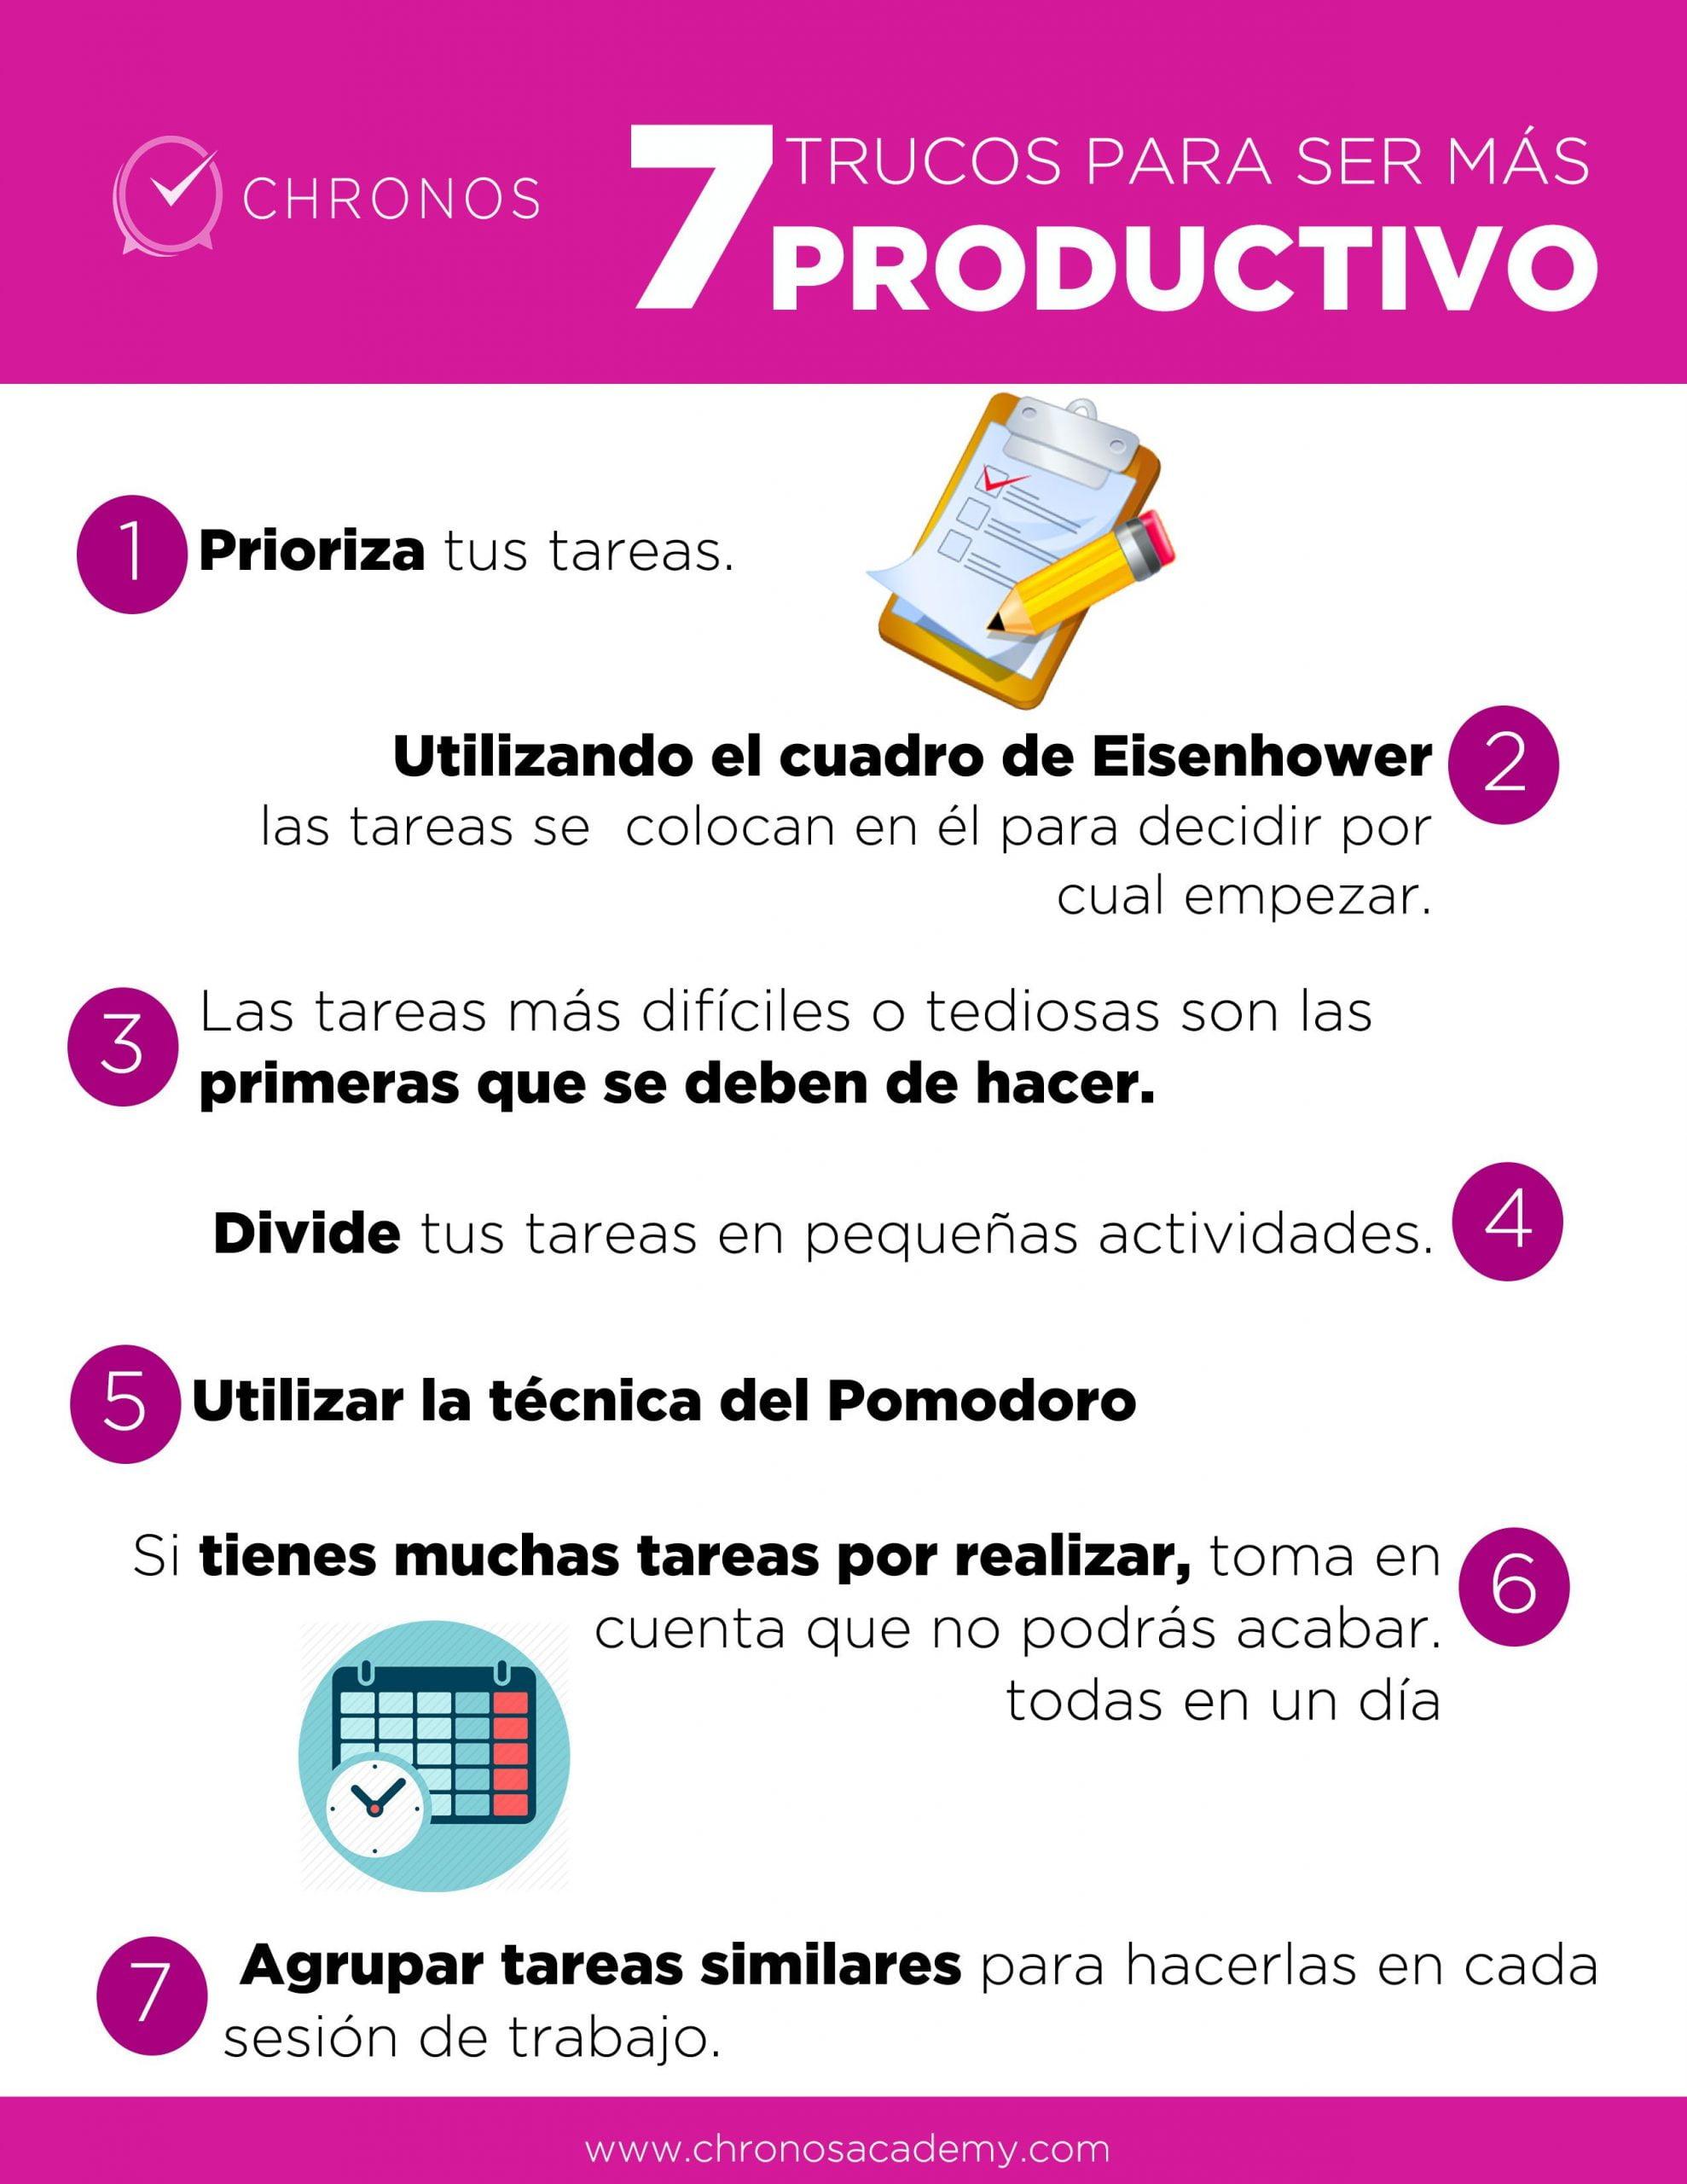 5 sencillos trucos para ser mas productivos